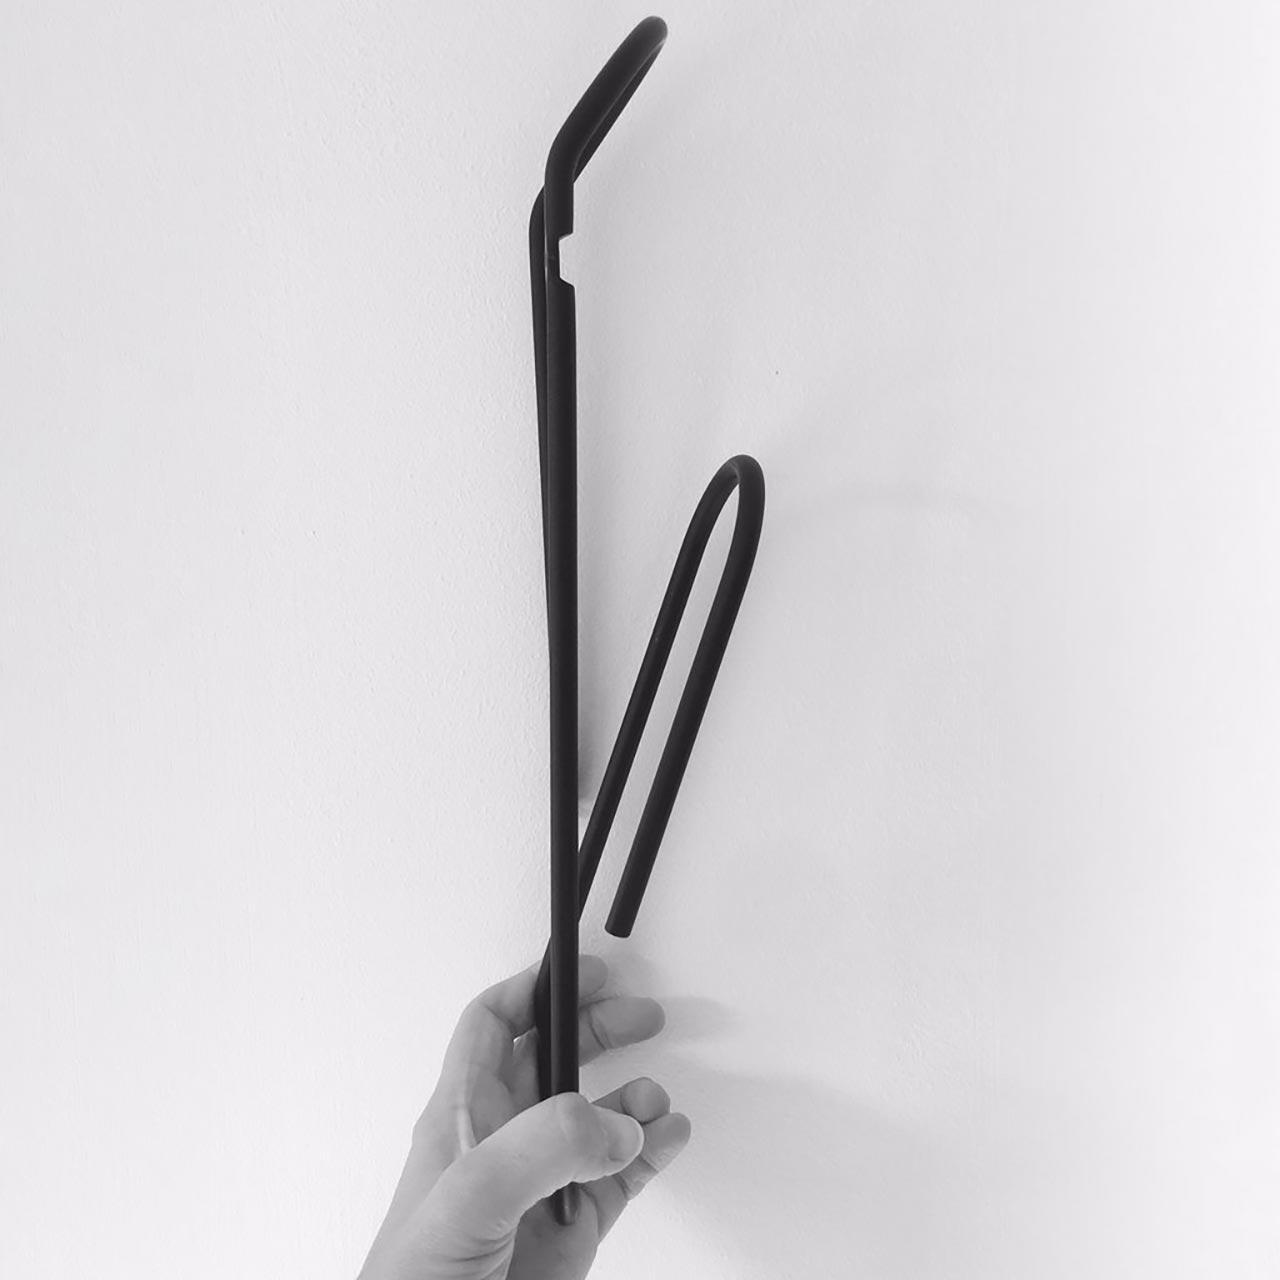 BENDO Luxe Paper Clip Coat Hook | Black, Copper, Chrome, Gold